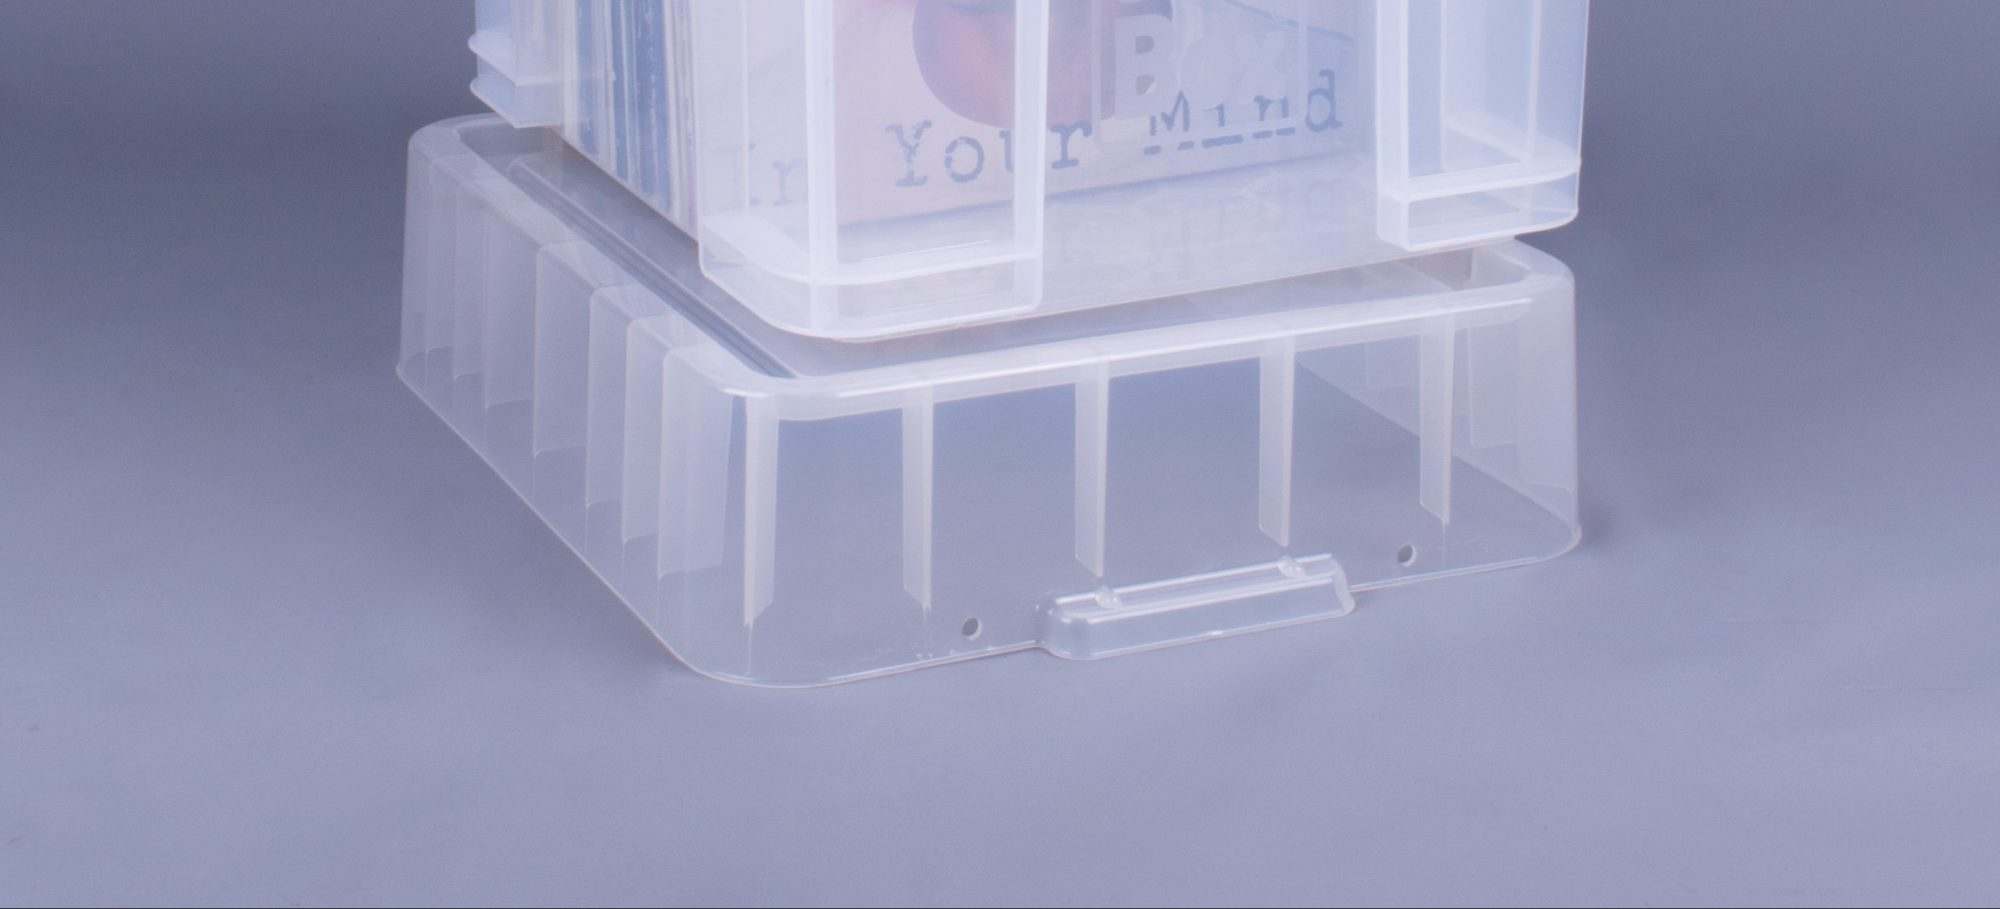 Picture of: Rub 35xxl Opbevarings Box Hojt Lag Til 90 Stk 12 Lp Klar Plast Renvinyl